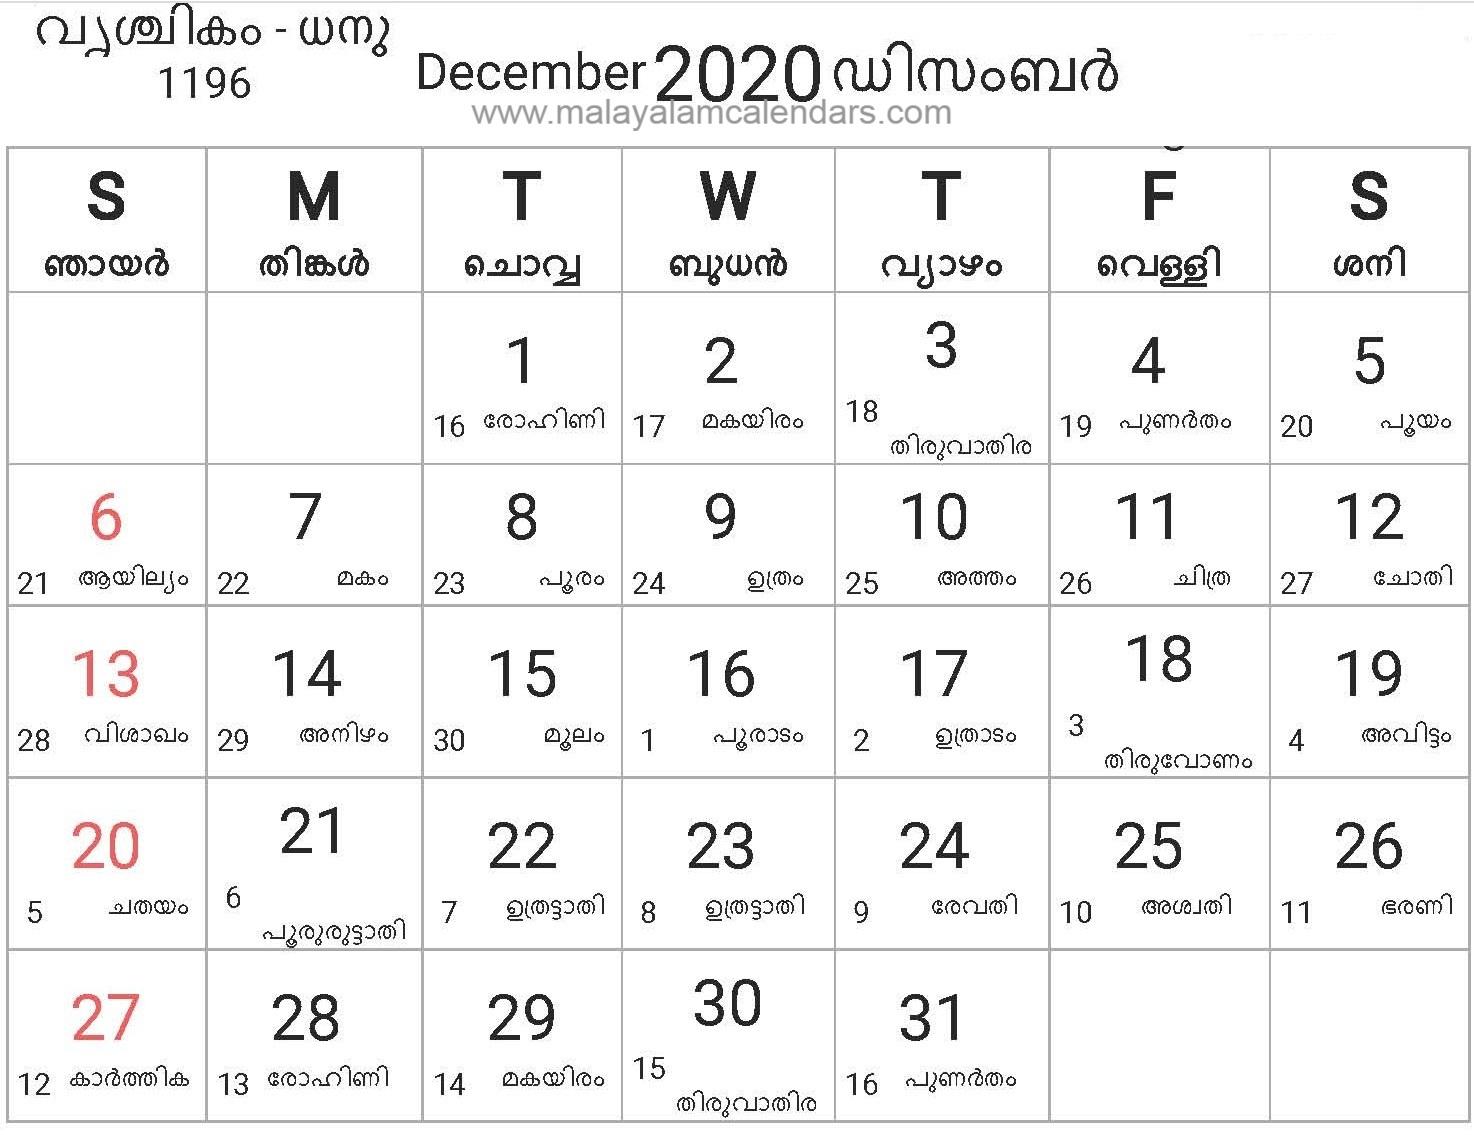 Malayalam Calendar December 2020 – Malayalamcalendars in Malayala Manorama Calendar 2020 December